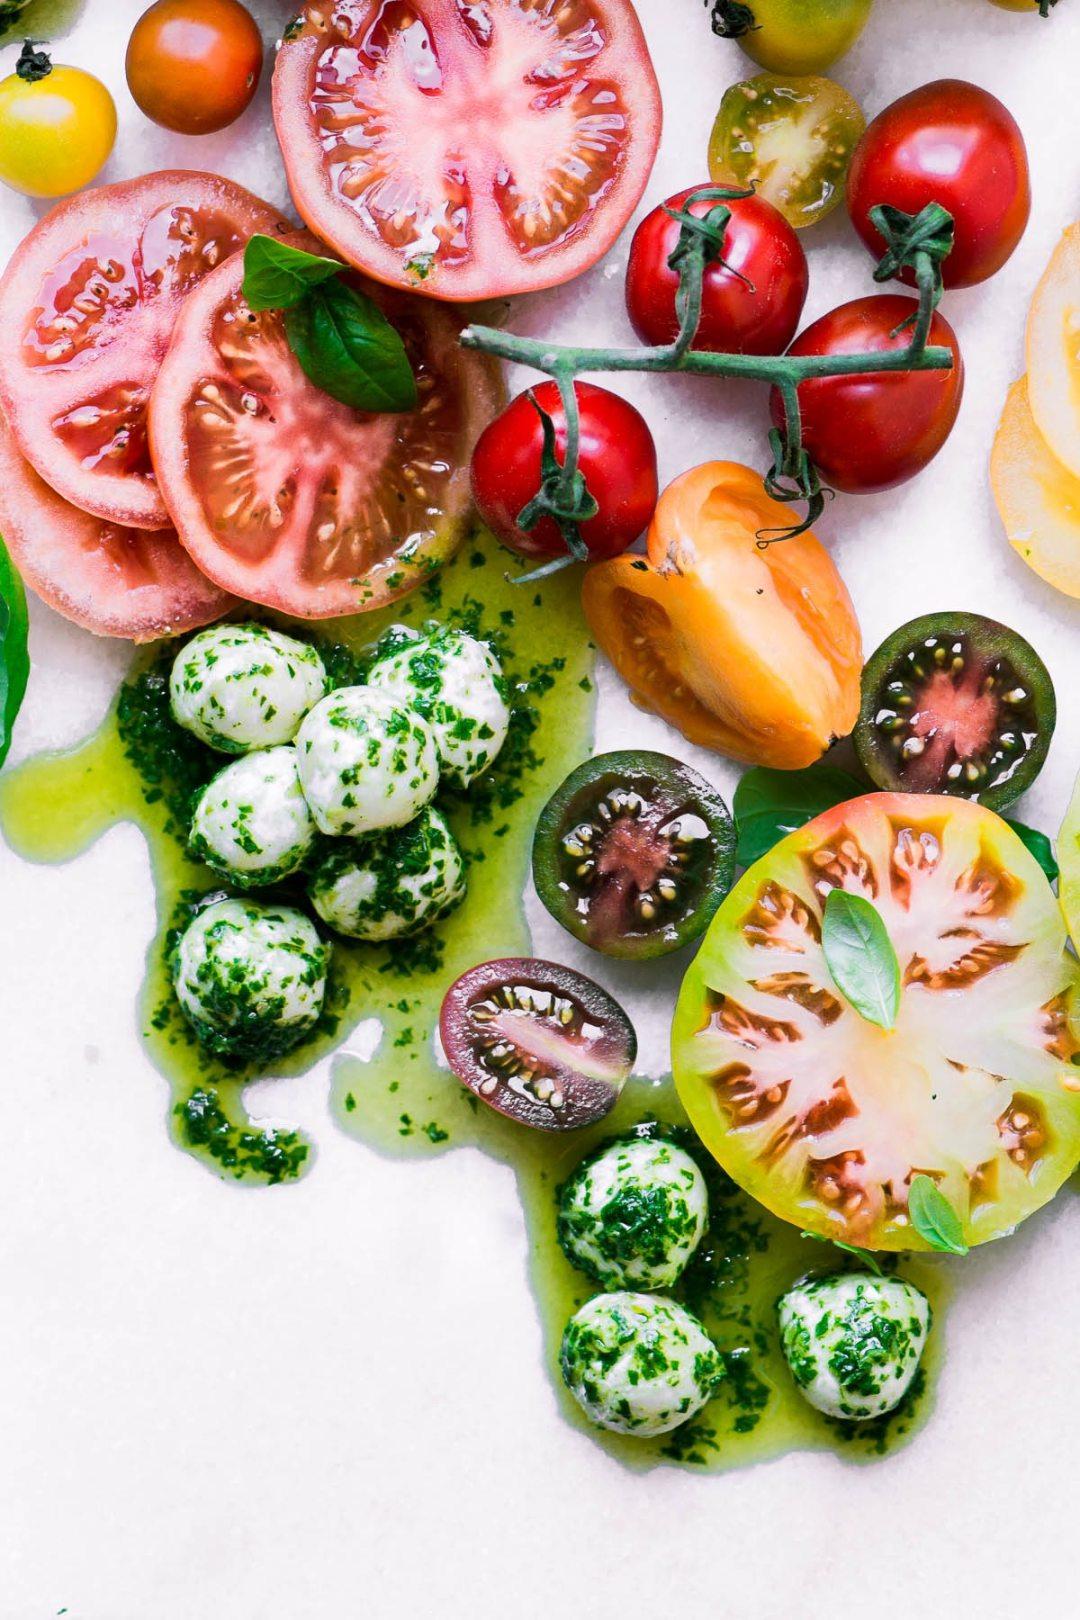 Basil marinated mozzarella with colorful summer tomatoes